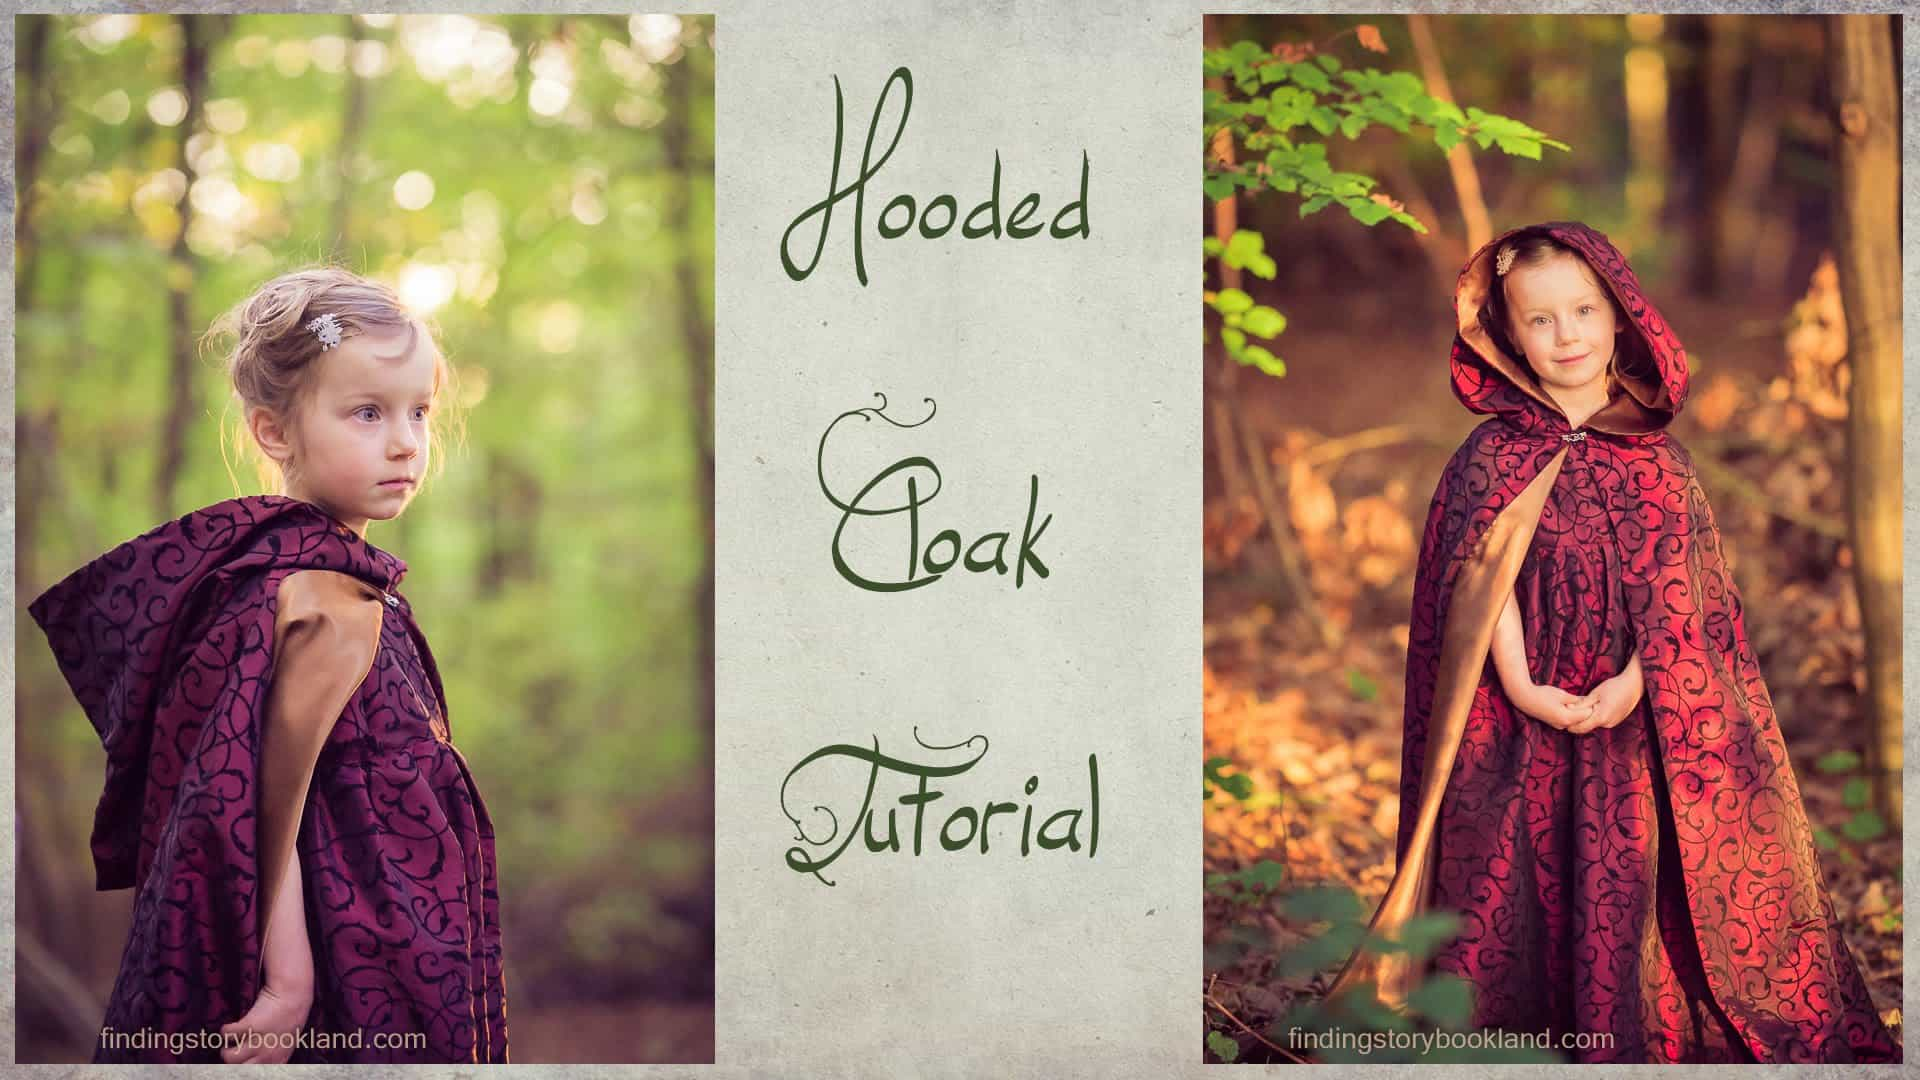 Princess style hooded cloak